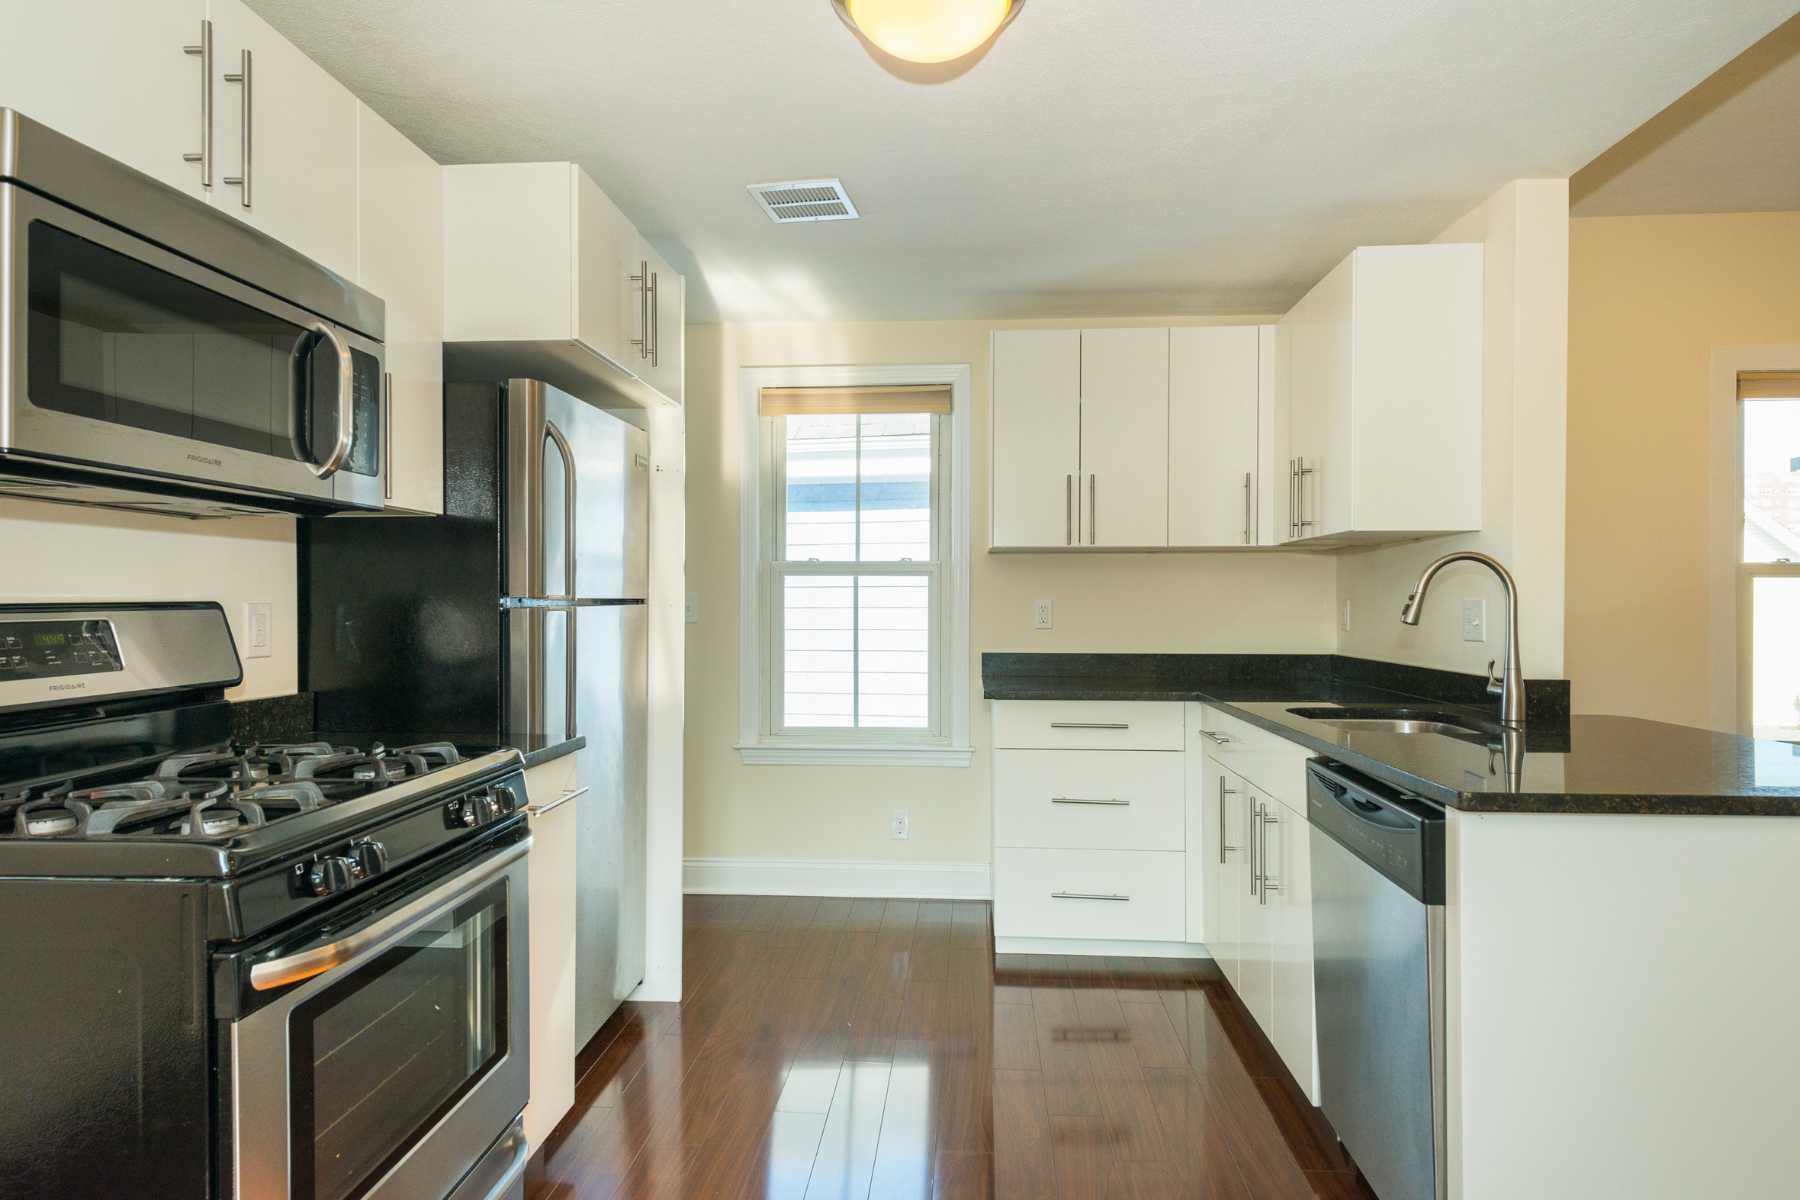 5-CapstoneCommunities-property-Dickinson-Street-Apartments-Somerville.jpg